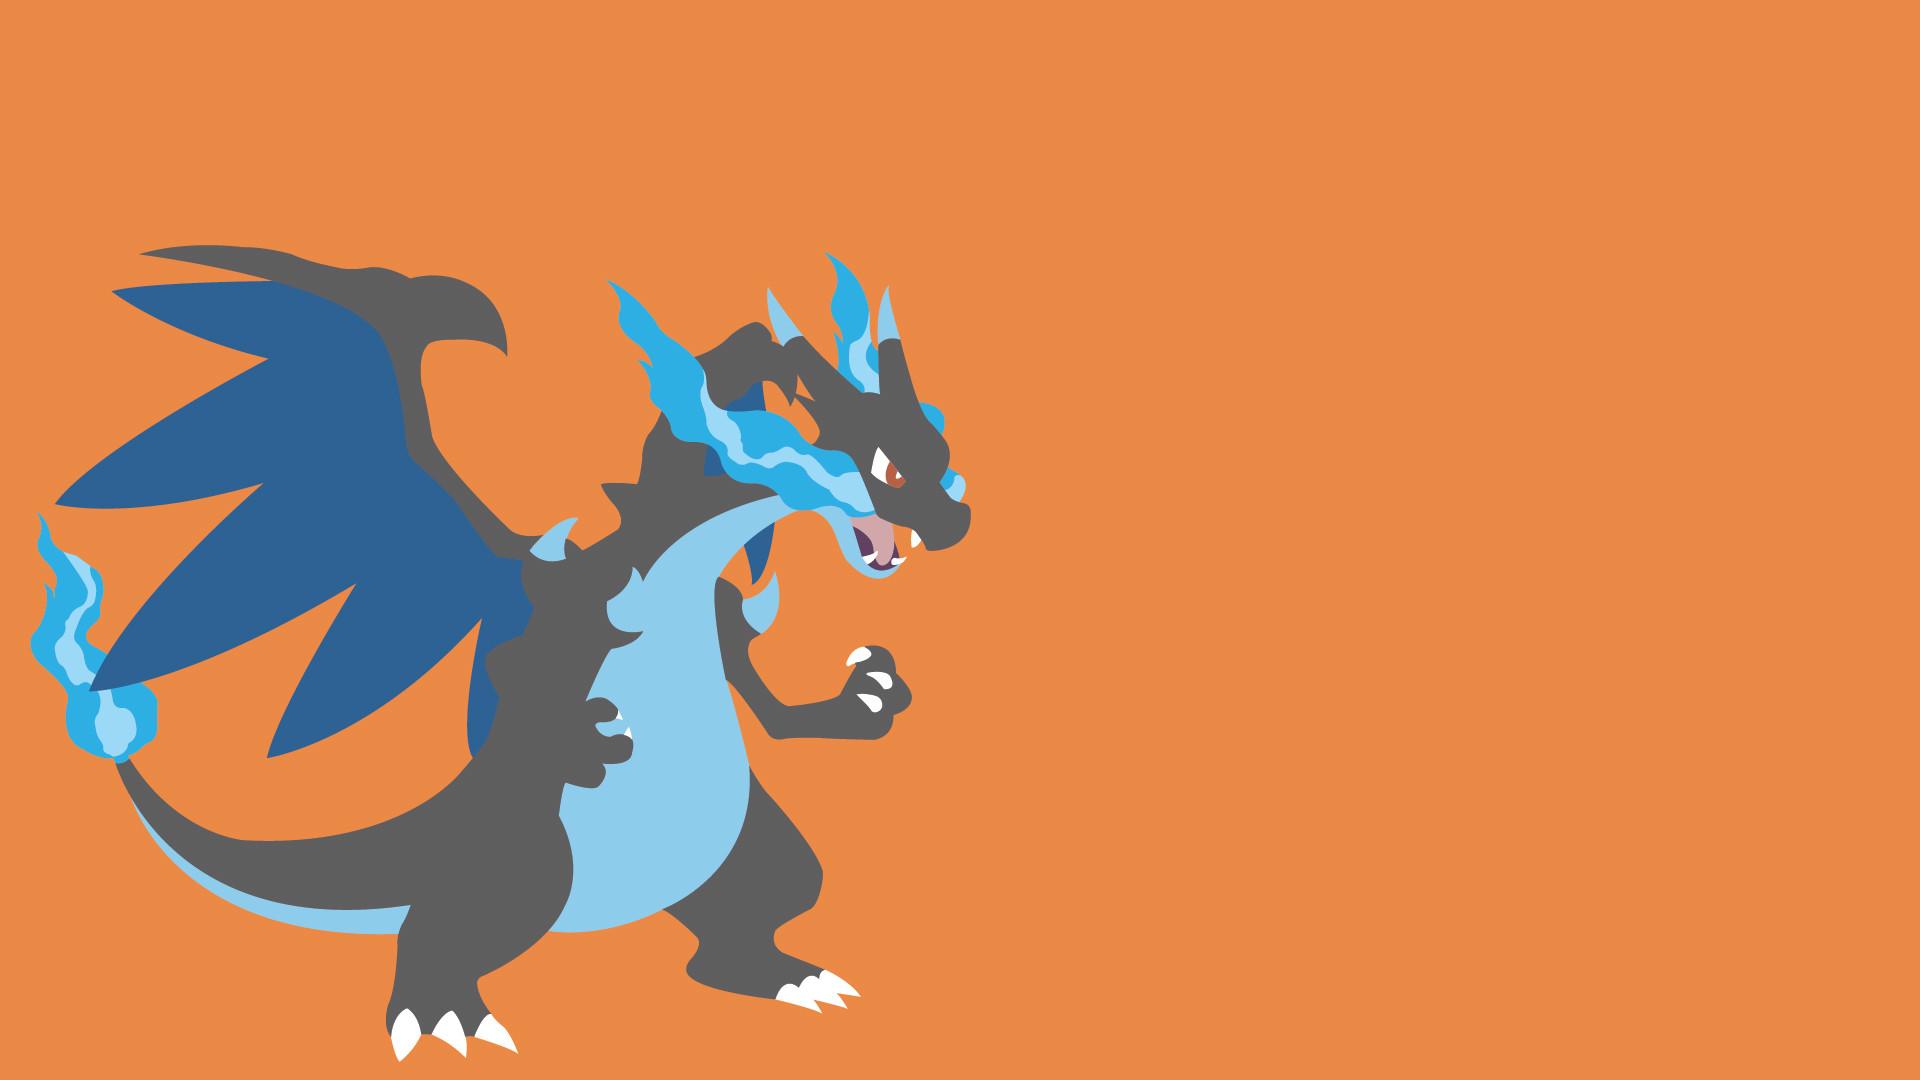 Pokémon HD Wallpaper | Background Image | 1920x1200 | ID ... |Mega Charizard Wallpaper Iphone